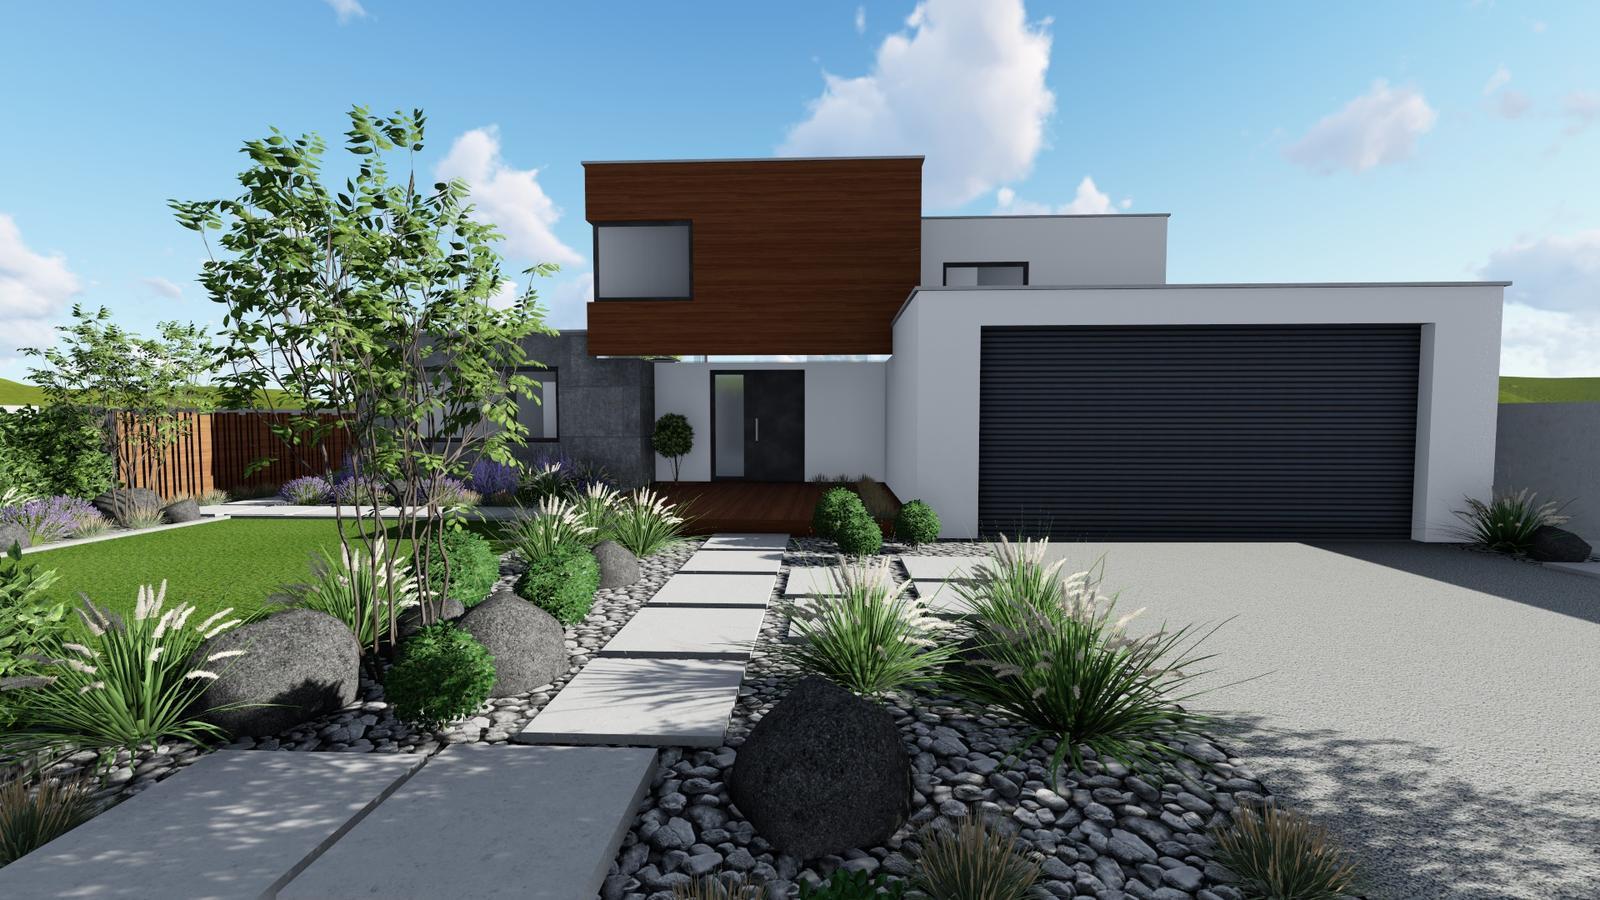 3D navrh zahradky - Obrázok č. 306